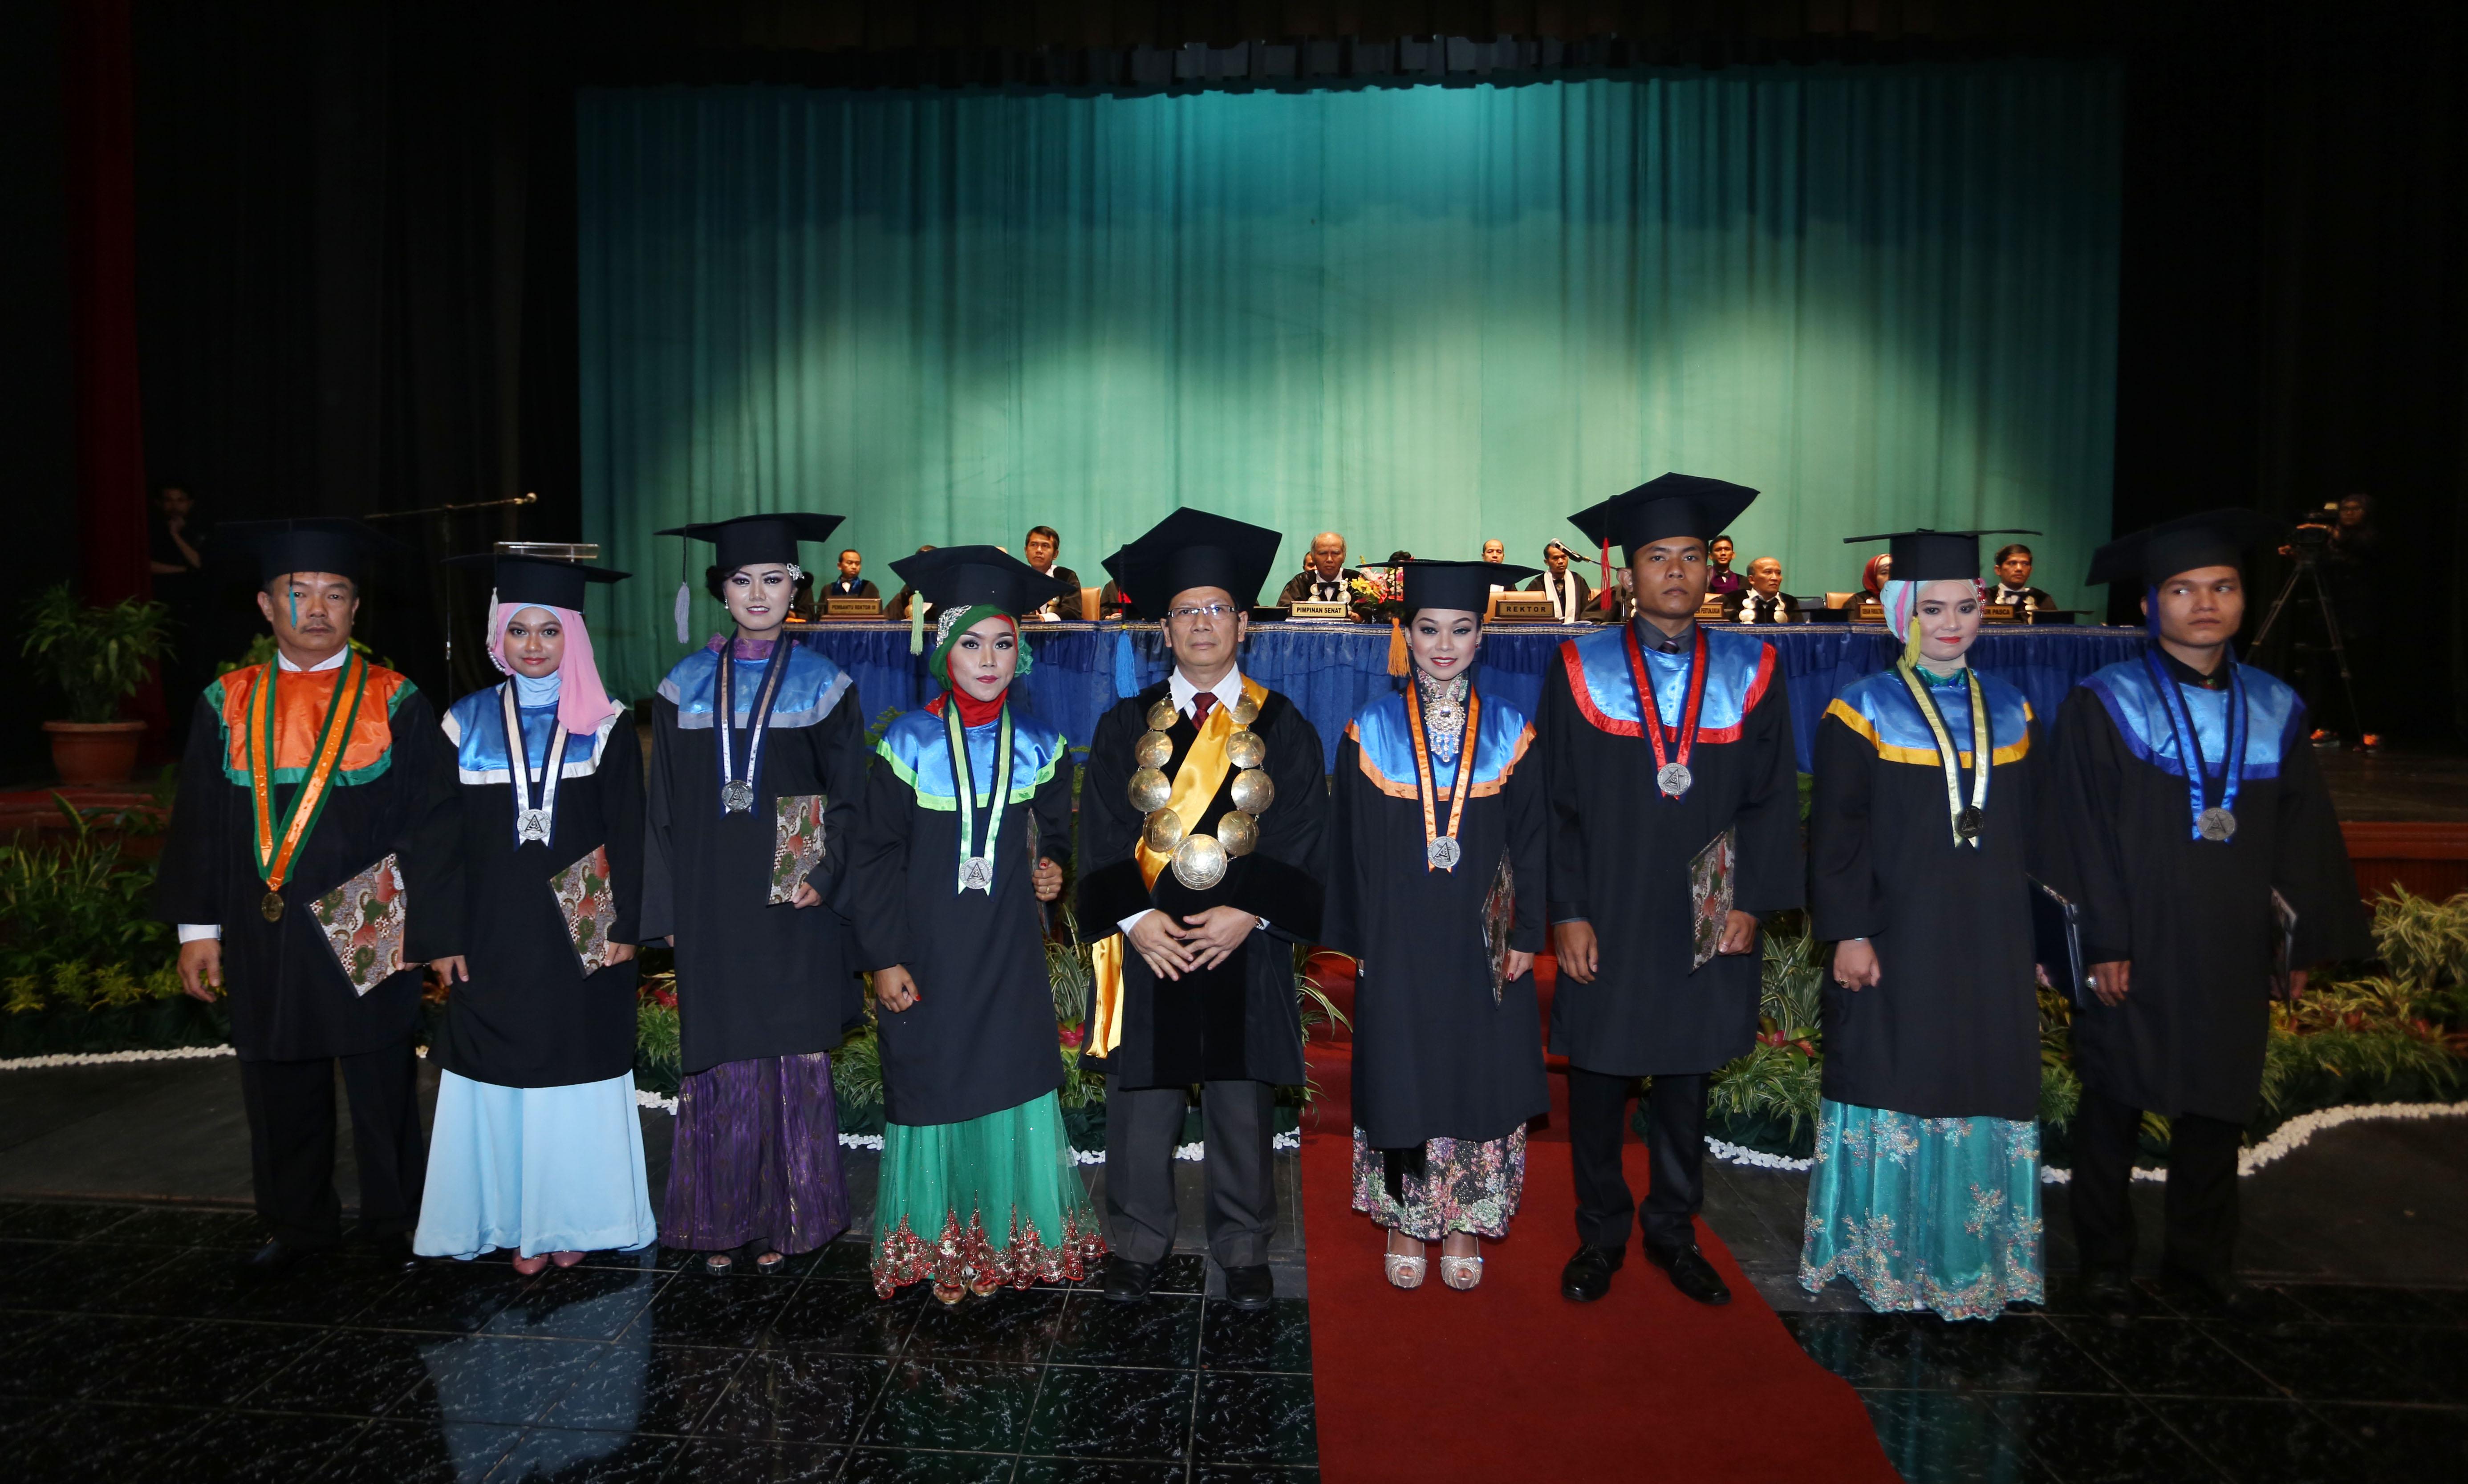 Rektor-Bersama-Mahasiswa-dengan-Nilai-Tertinggi-Setiap-Jurusan